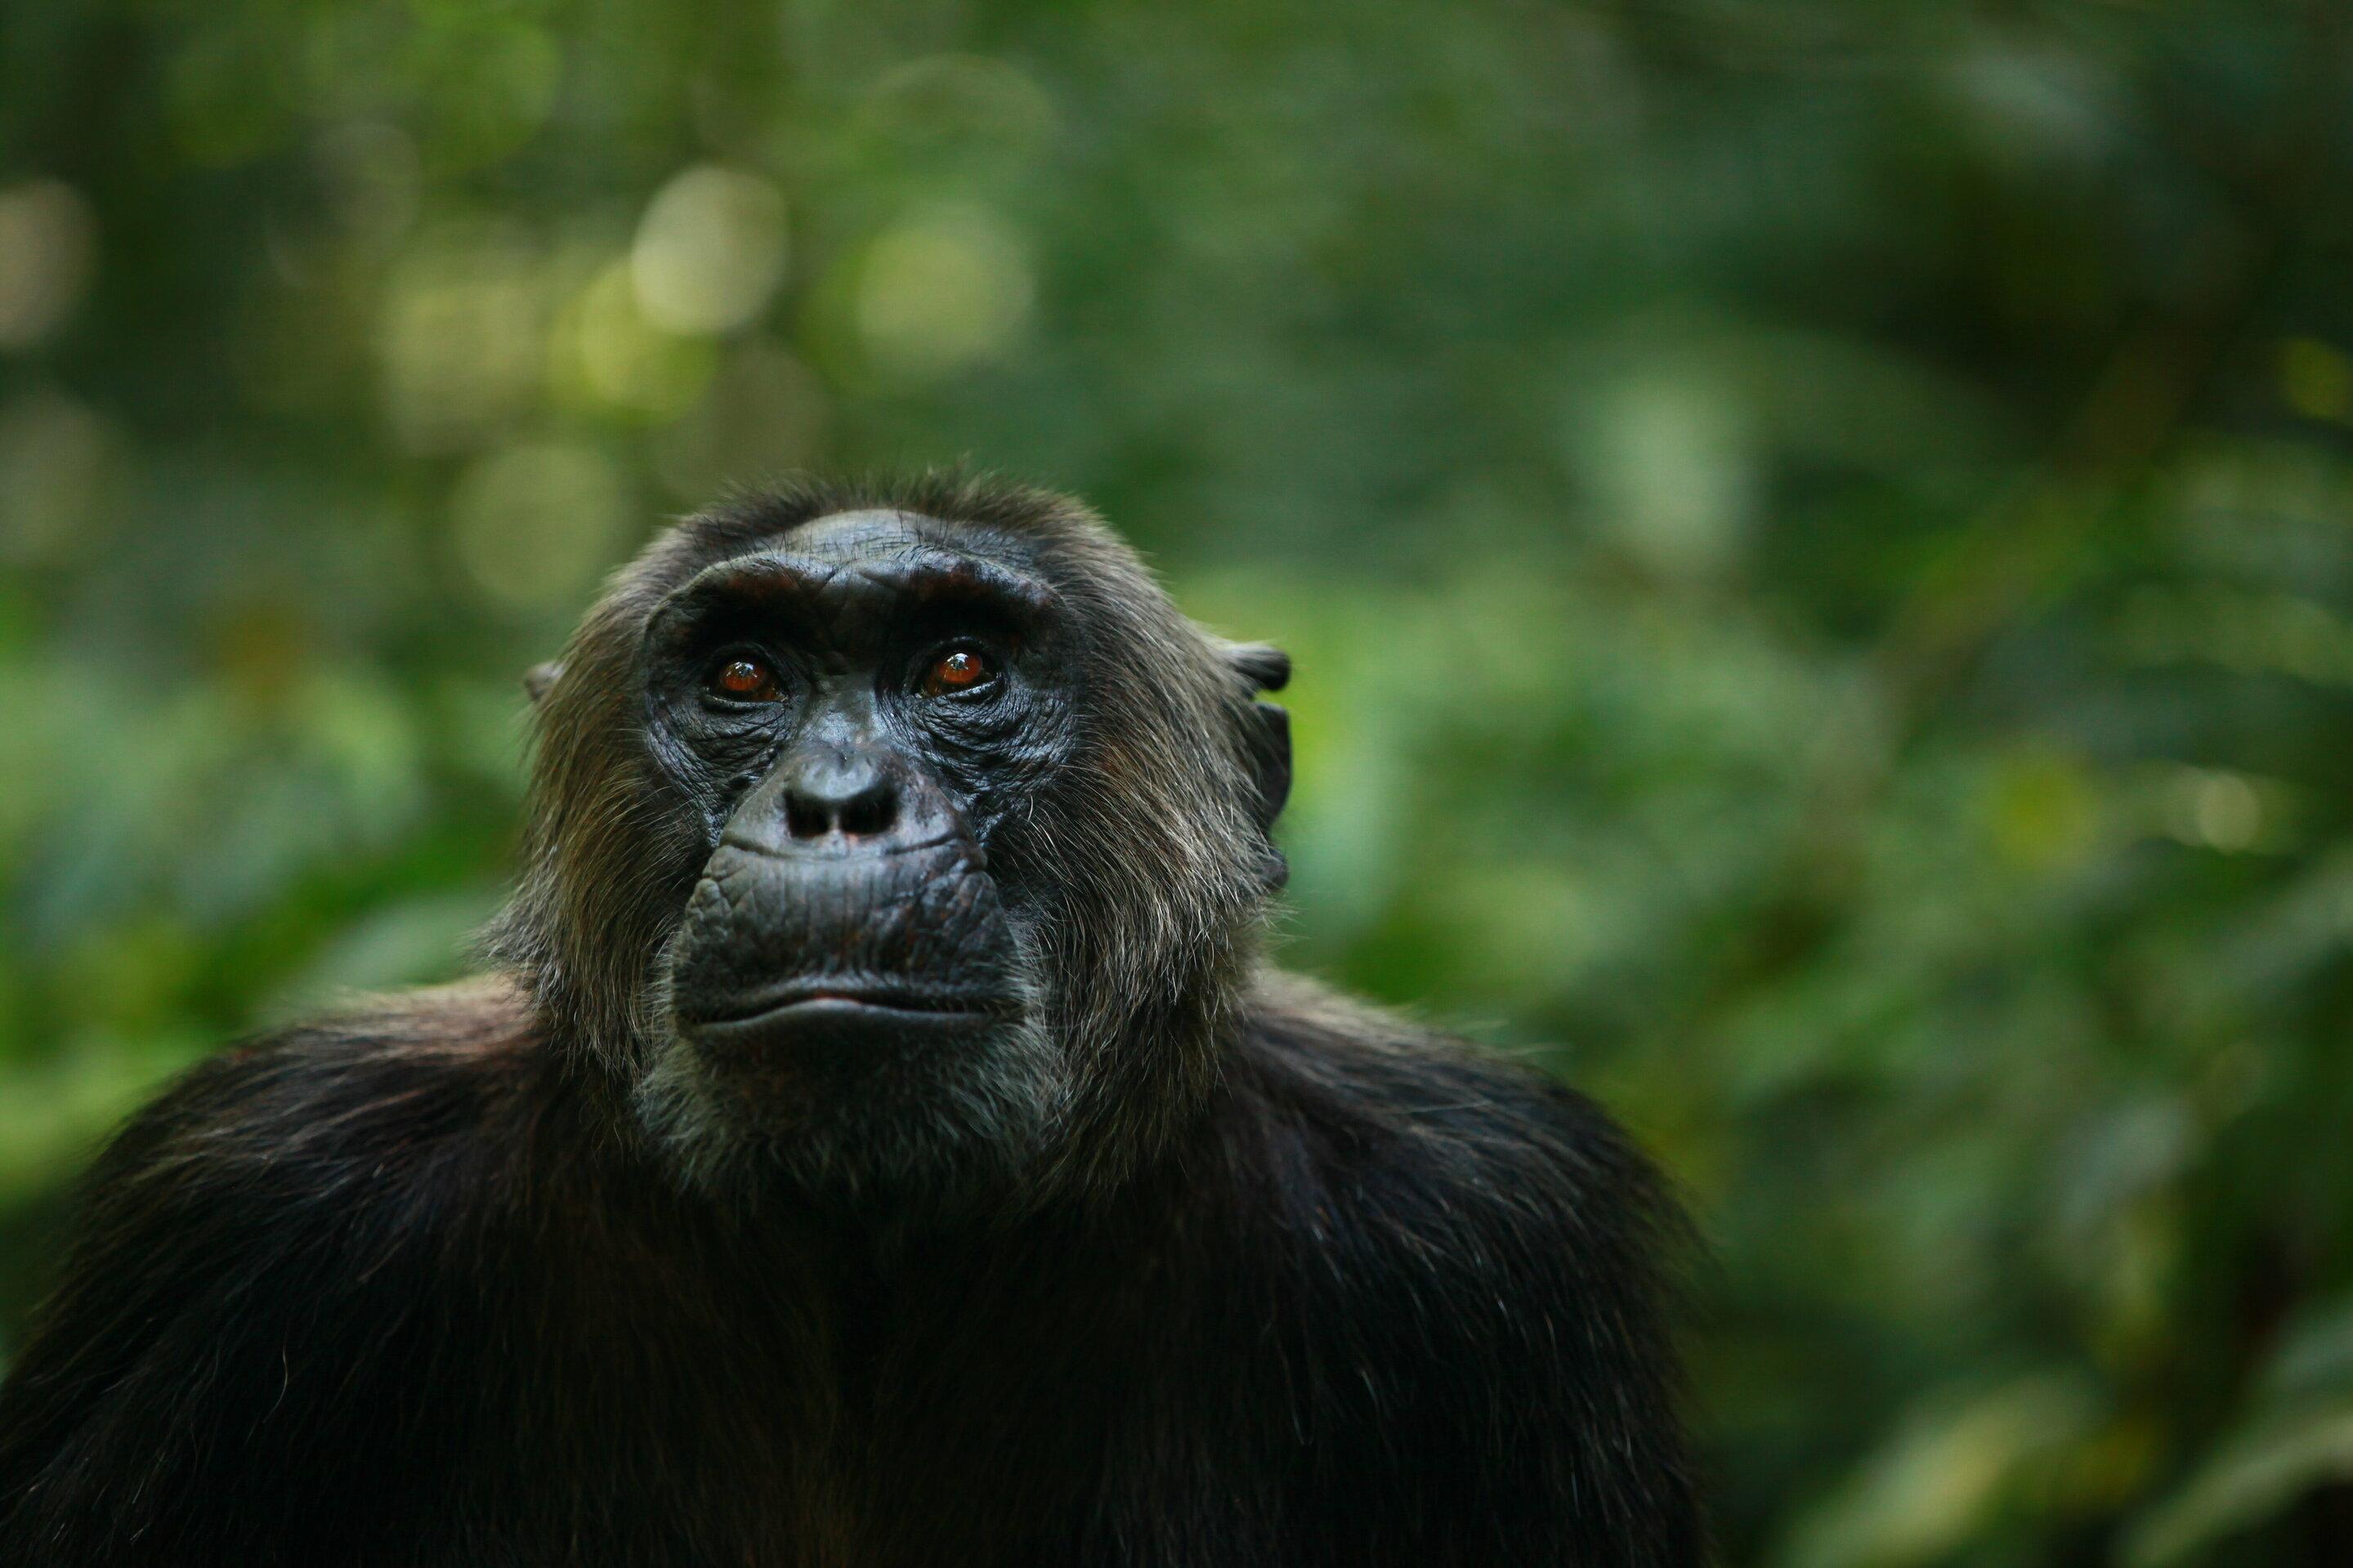 Human Impacts Erode Behavioral Diversity In Chimpanzees